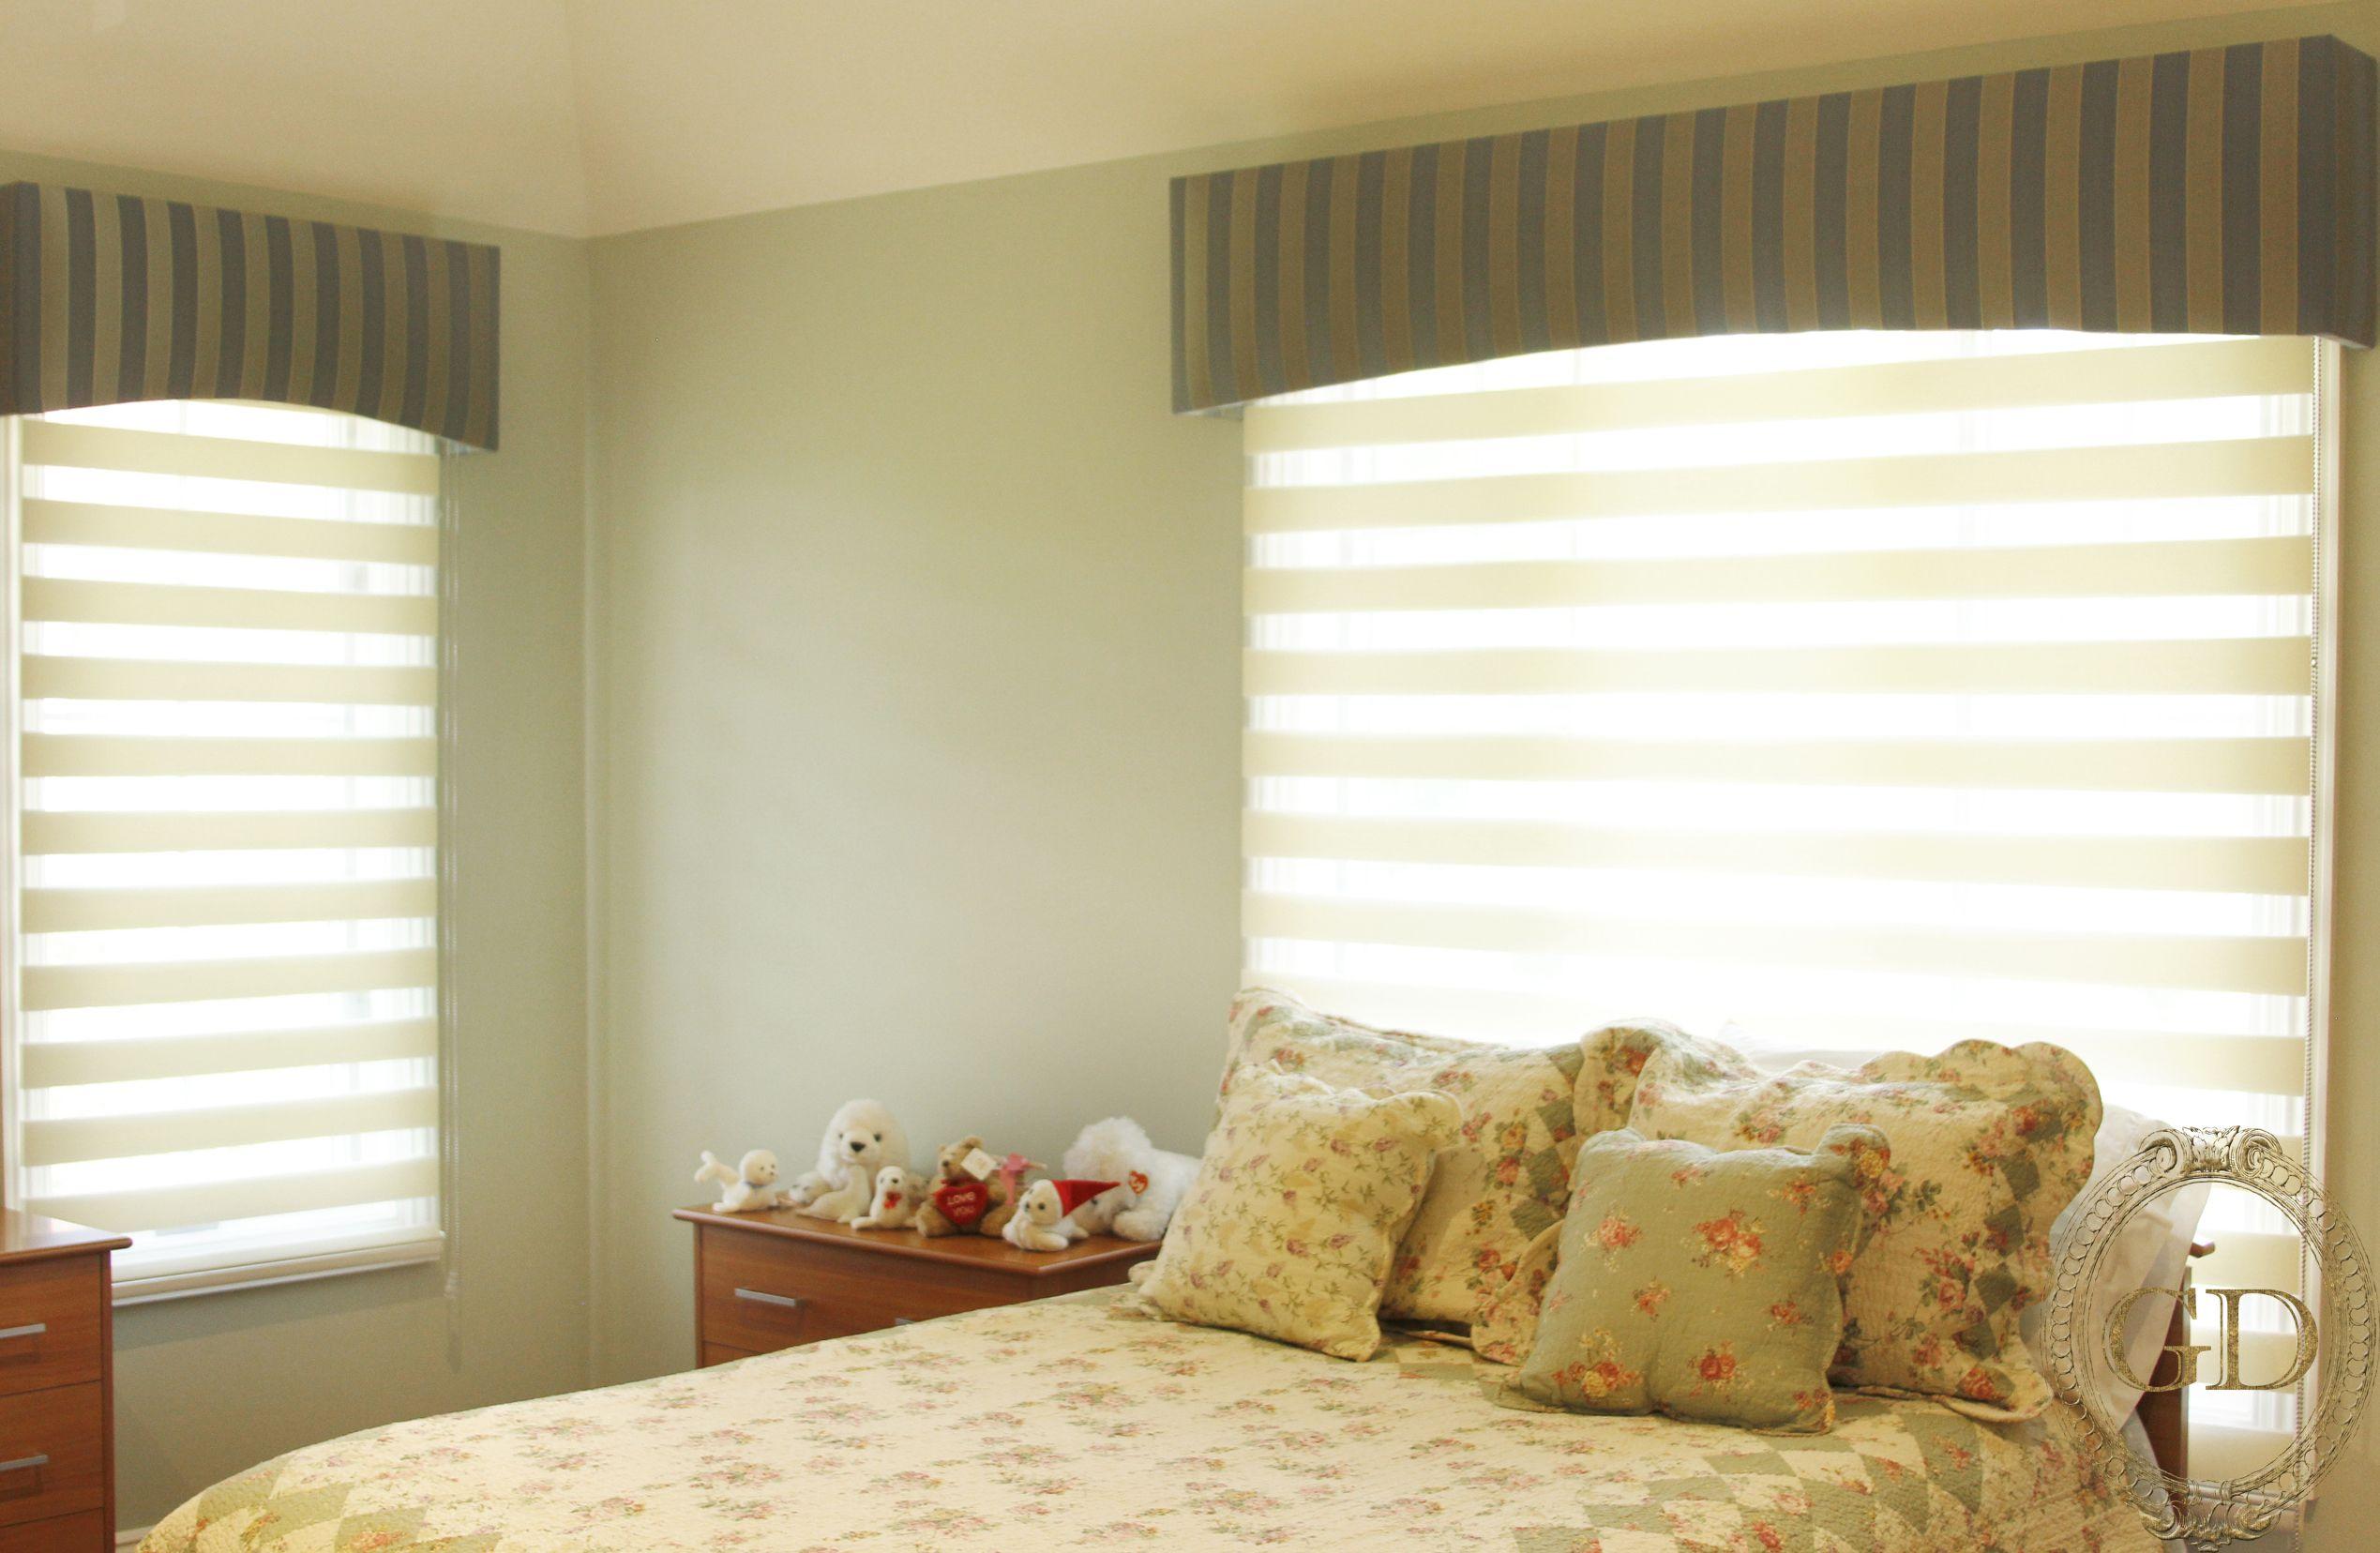 4 window curtain ideas  hasheem cornice   bedroom drapery  pinterest  drapery ideas